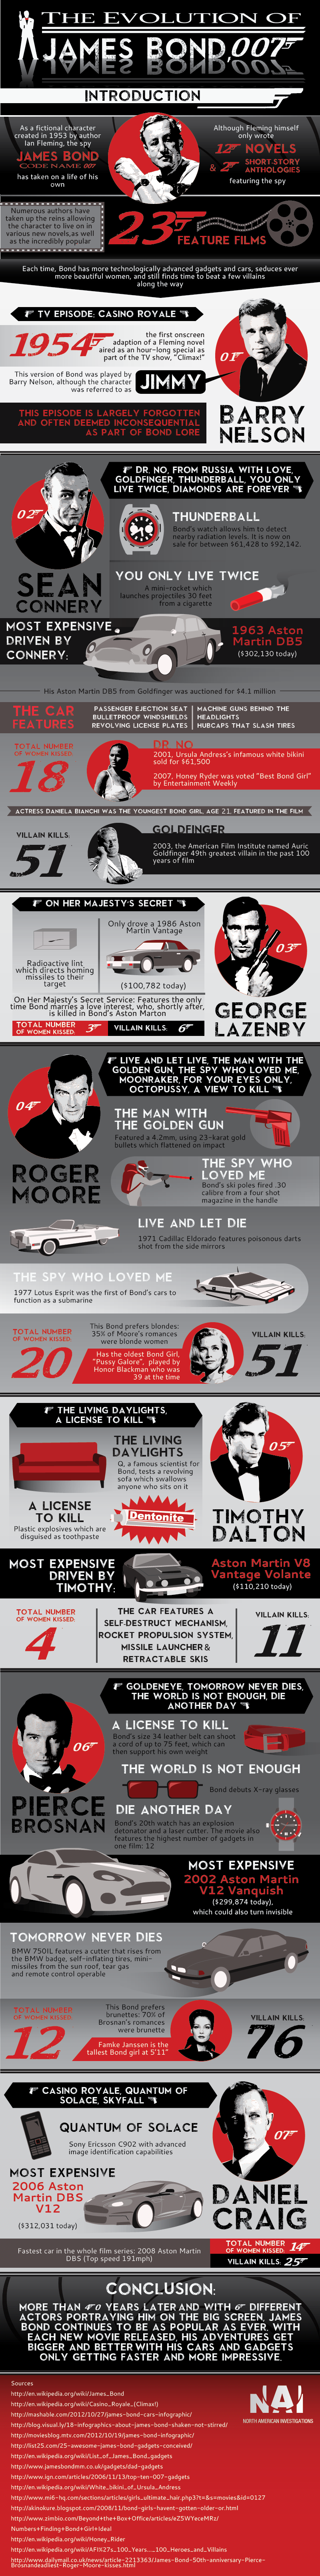 12. The evolution of James Bond